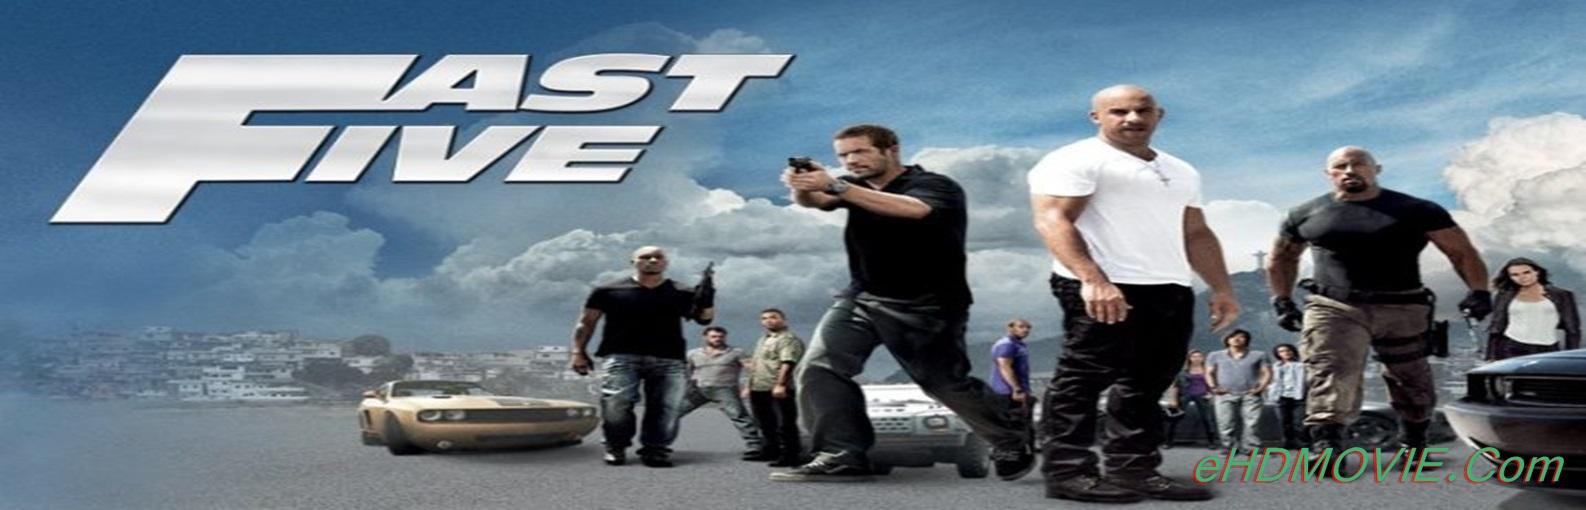 Fast Five 2011 Full Movie Dual Audio [Hindi – English] 1080p - 720p - 480p ORG BRRip 450MB - 1GB - 6.3GB ESubs Free Download